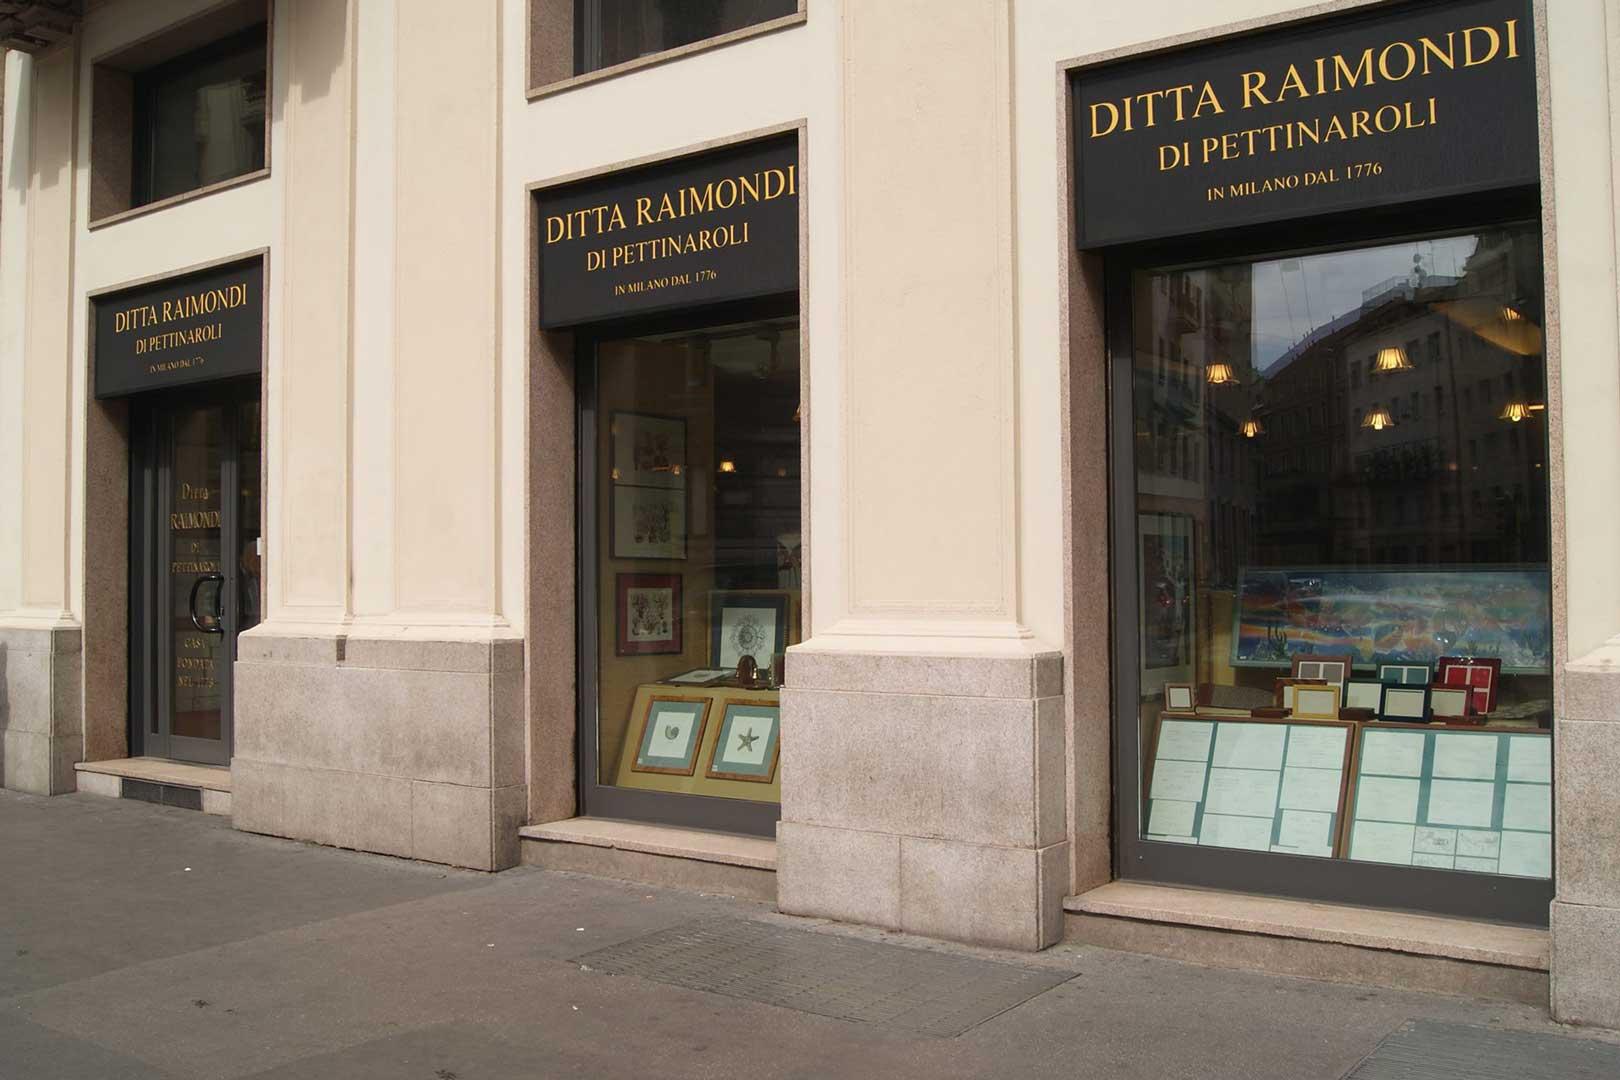 Ditta Raimondi di Pettinaroli - Milano